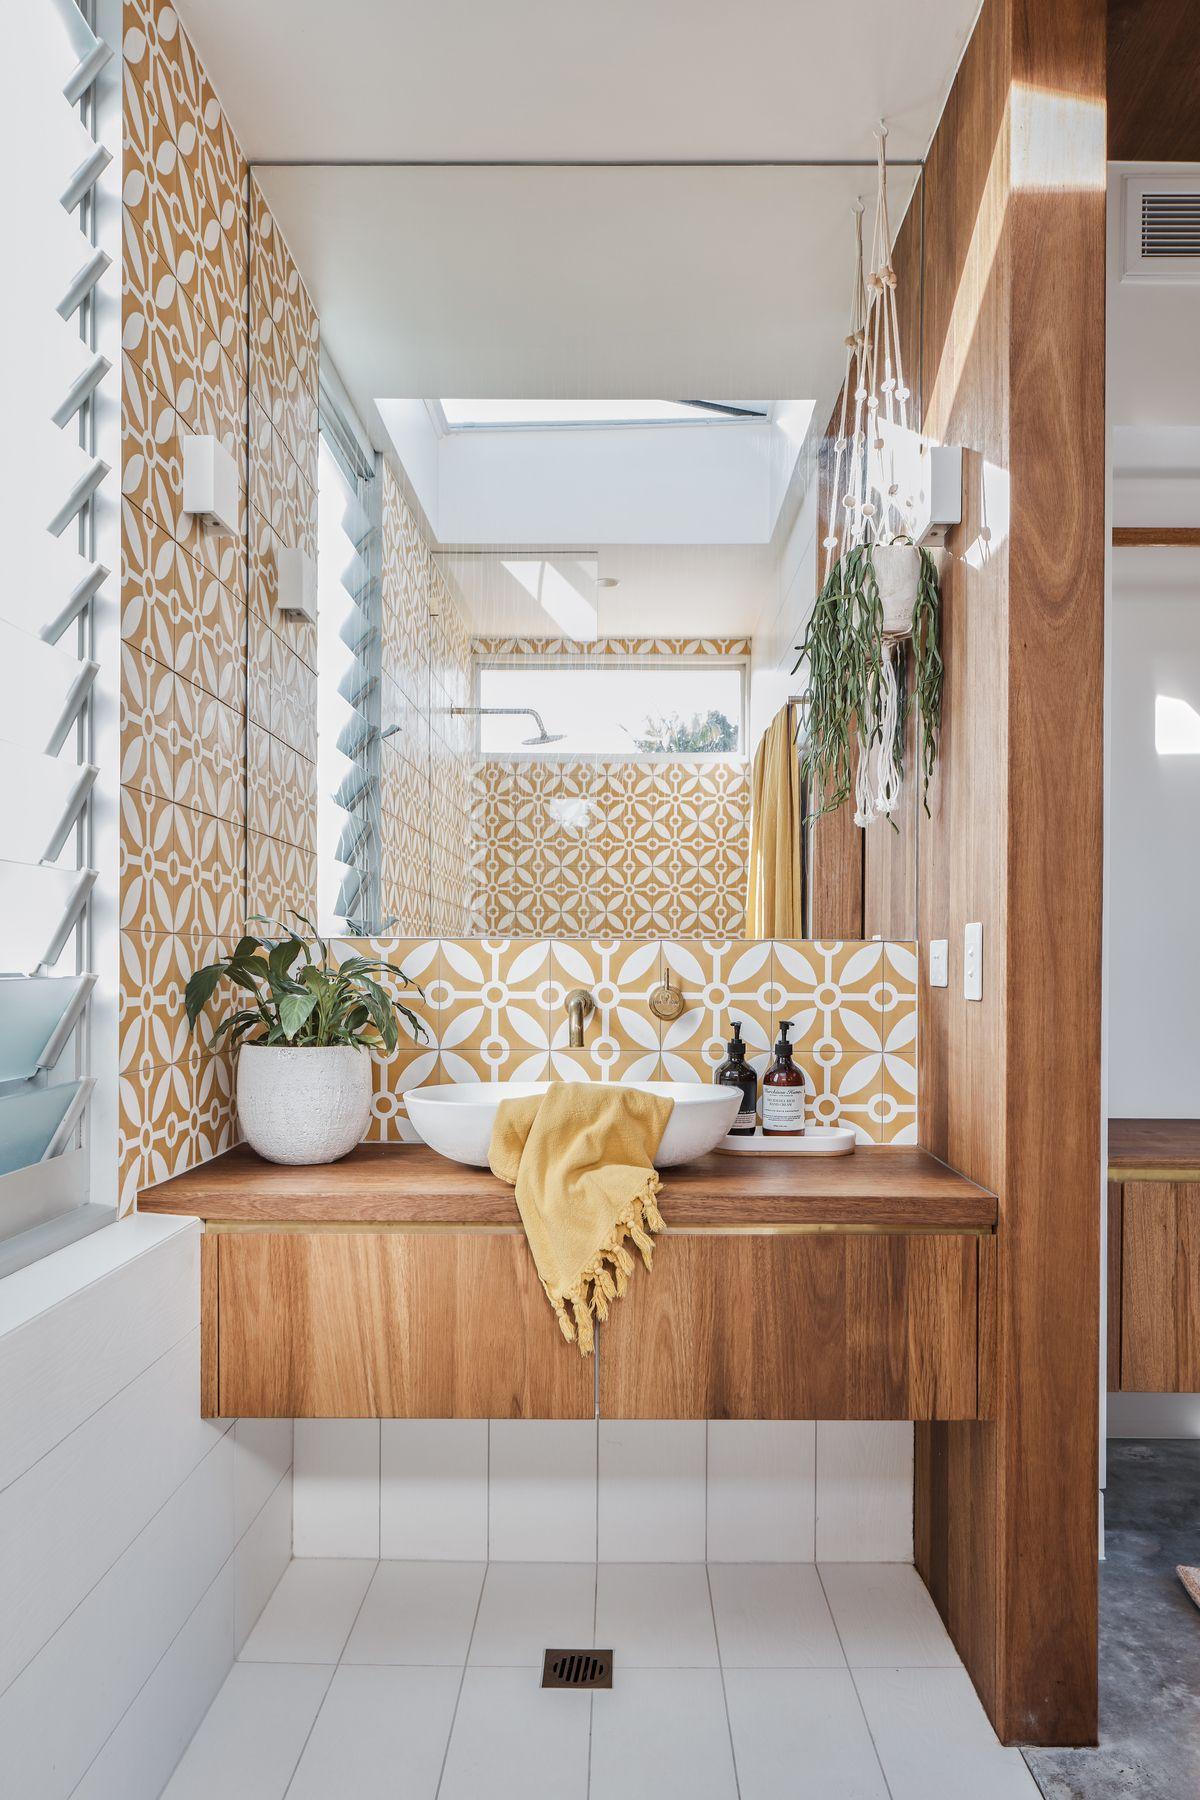 Badezimmer ideen über toilette marvell street studio reimagining a coastal backyard  architecture